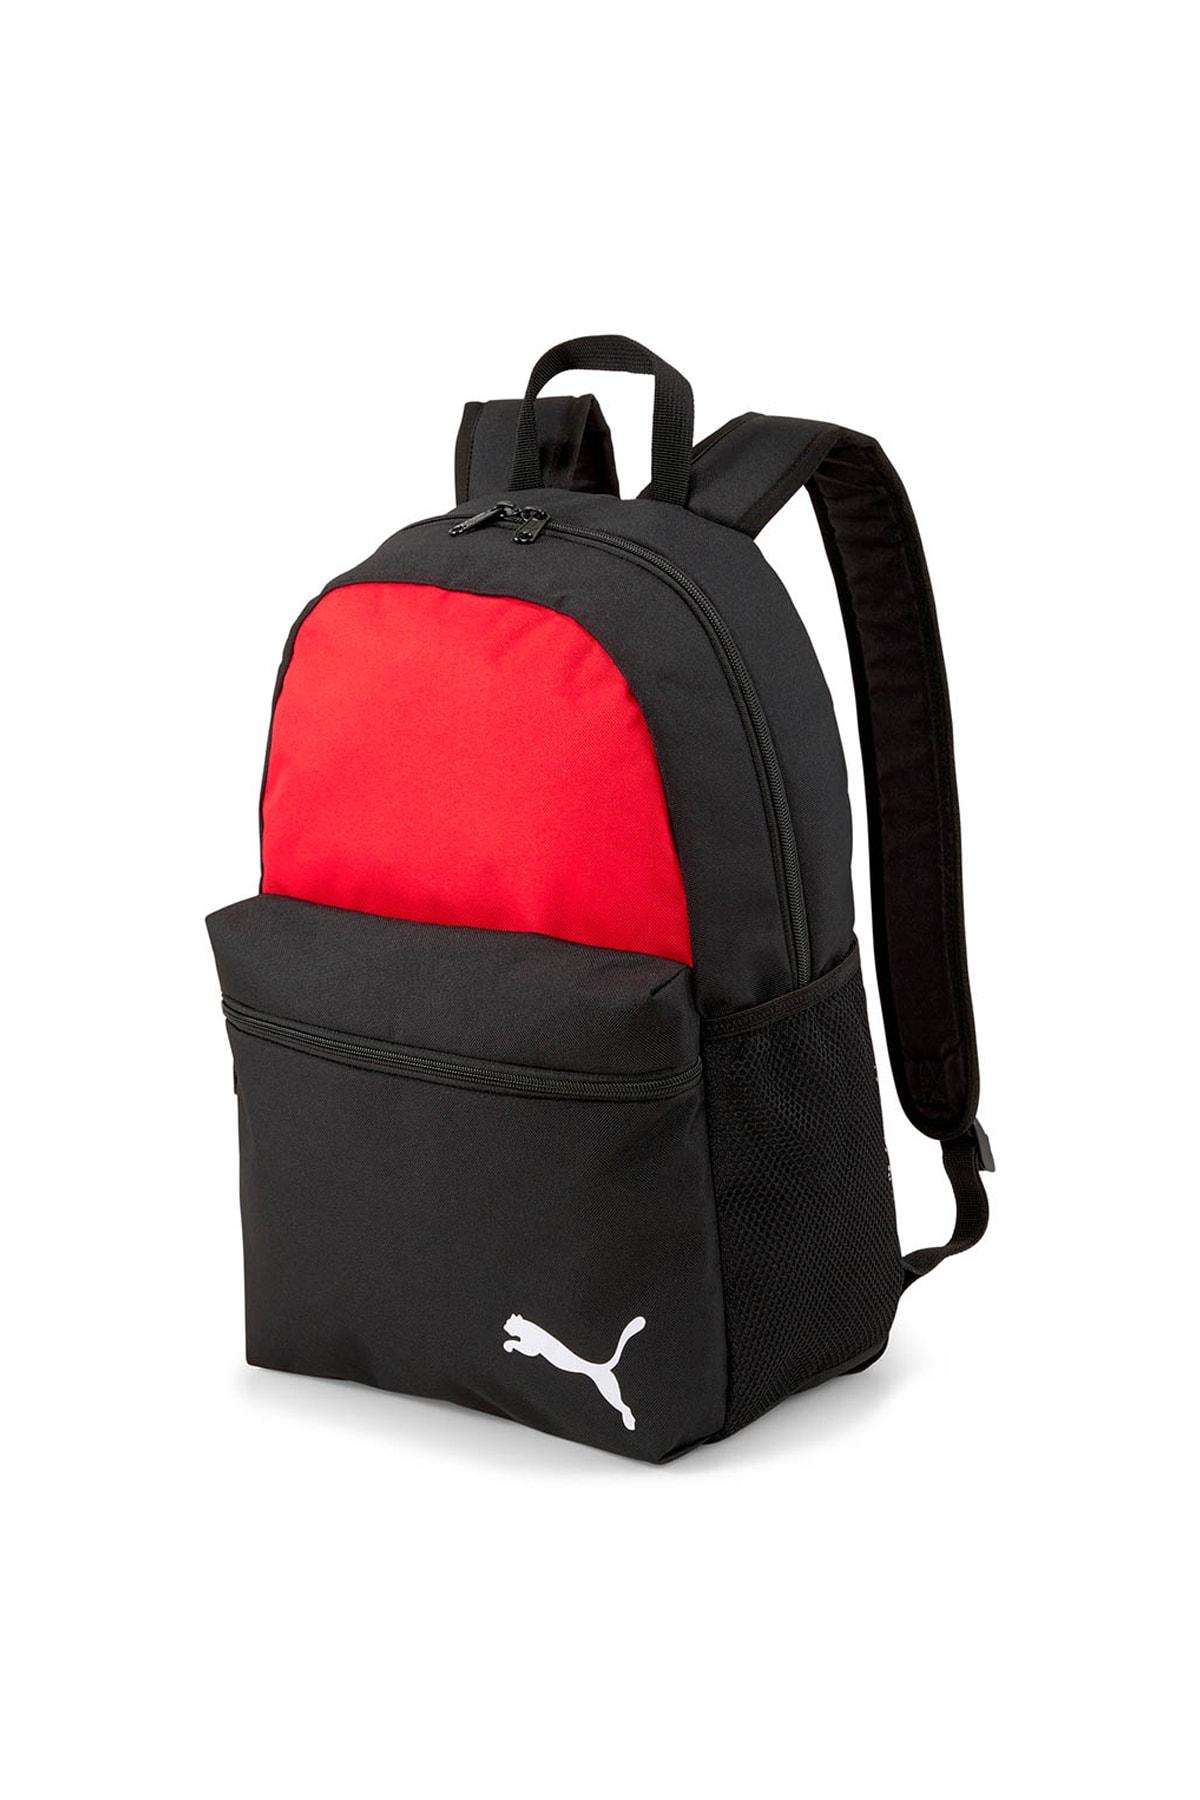 Puma teamGOAL 23 Backpack Core Unisex Sırt Çantası 1